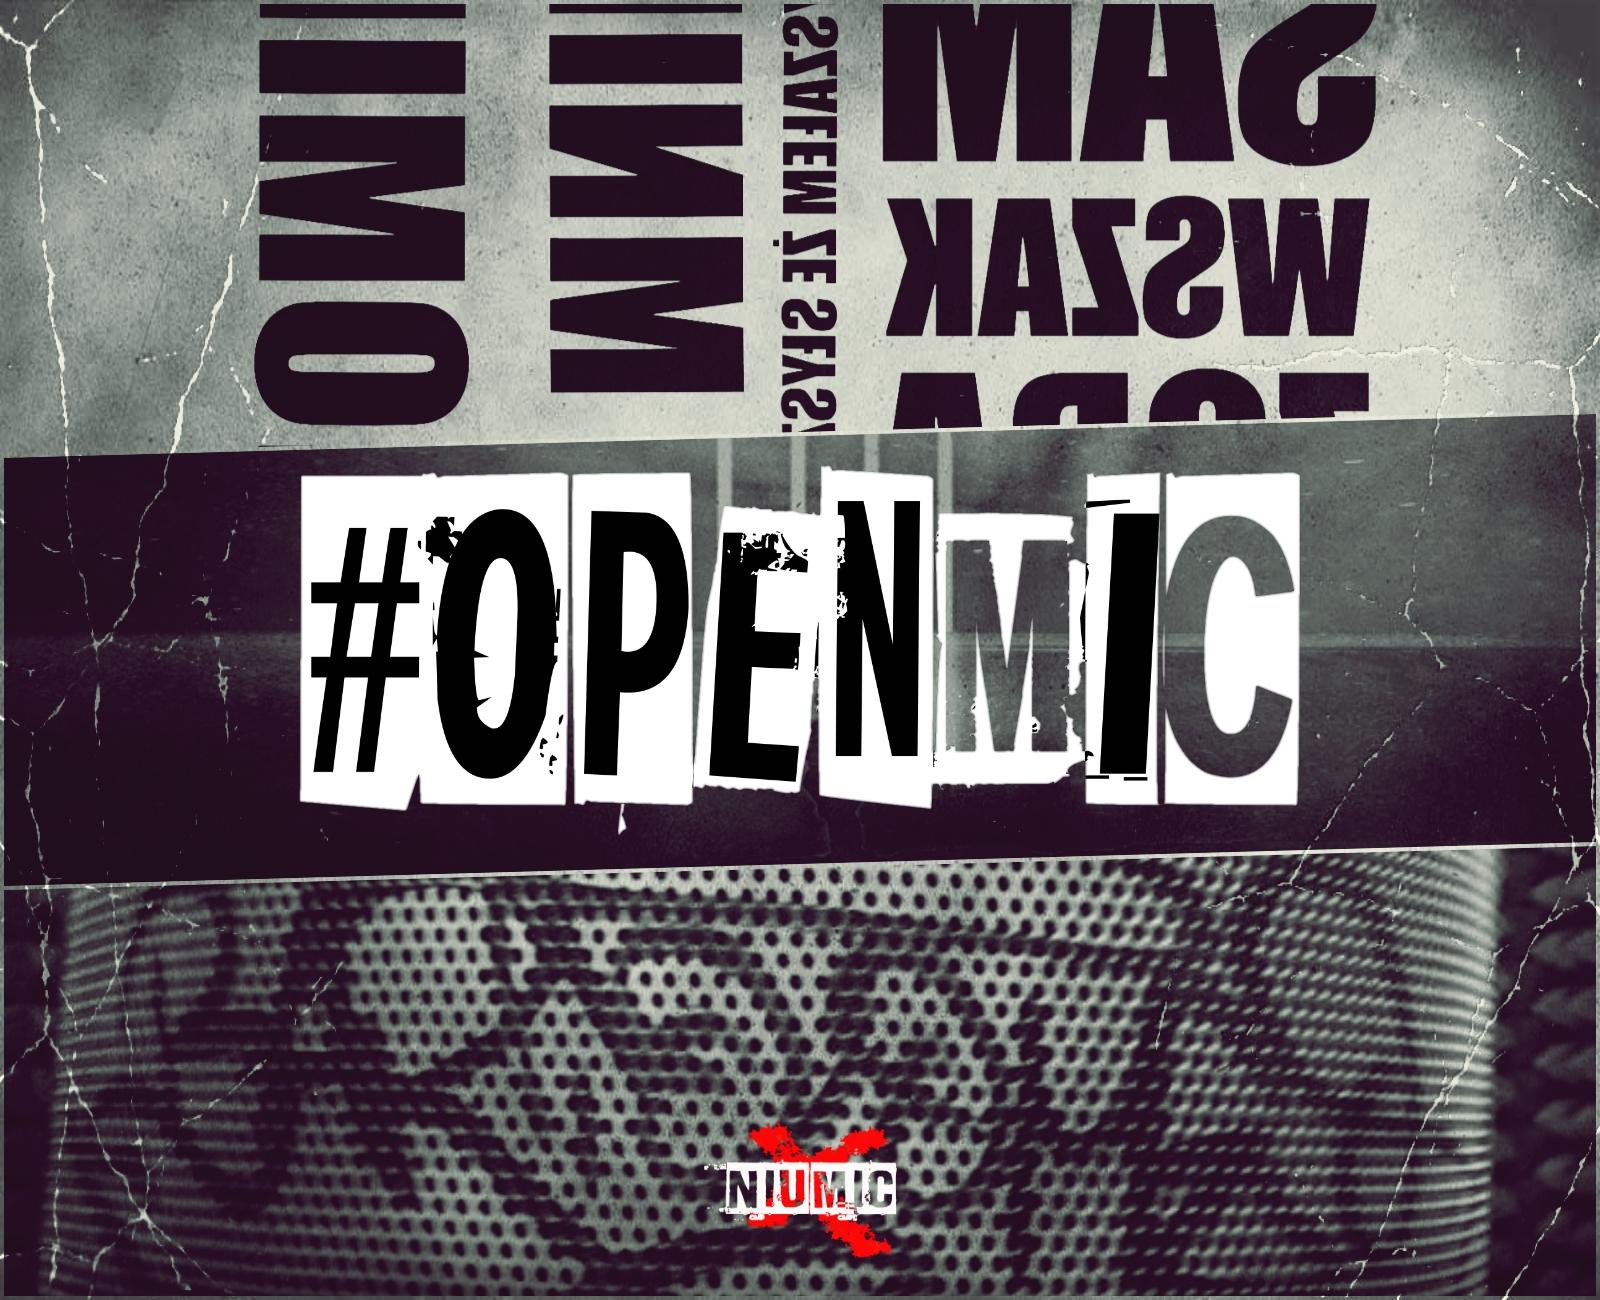 AeSPe, Emikae, Bartolomeo | Odpalam Podziemie || #OPENMIC